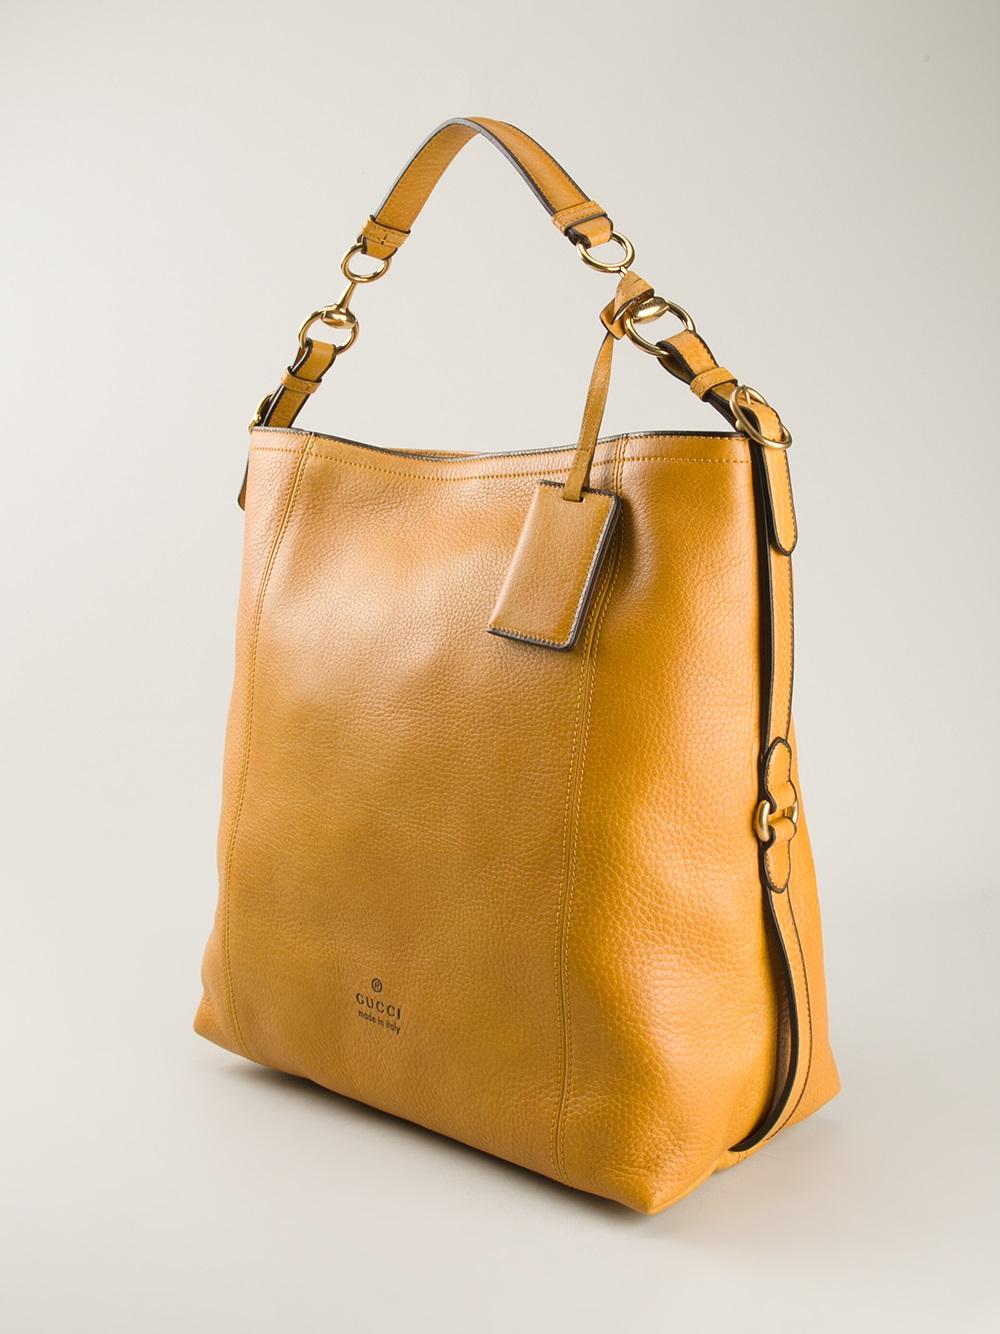 Lyst - Gucci Harness Hobo Bag in Yellow 3282a32b07c1e